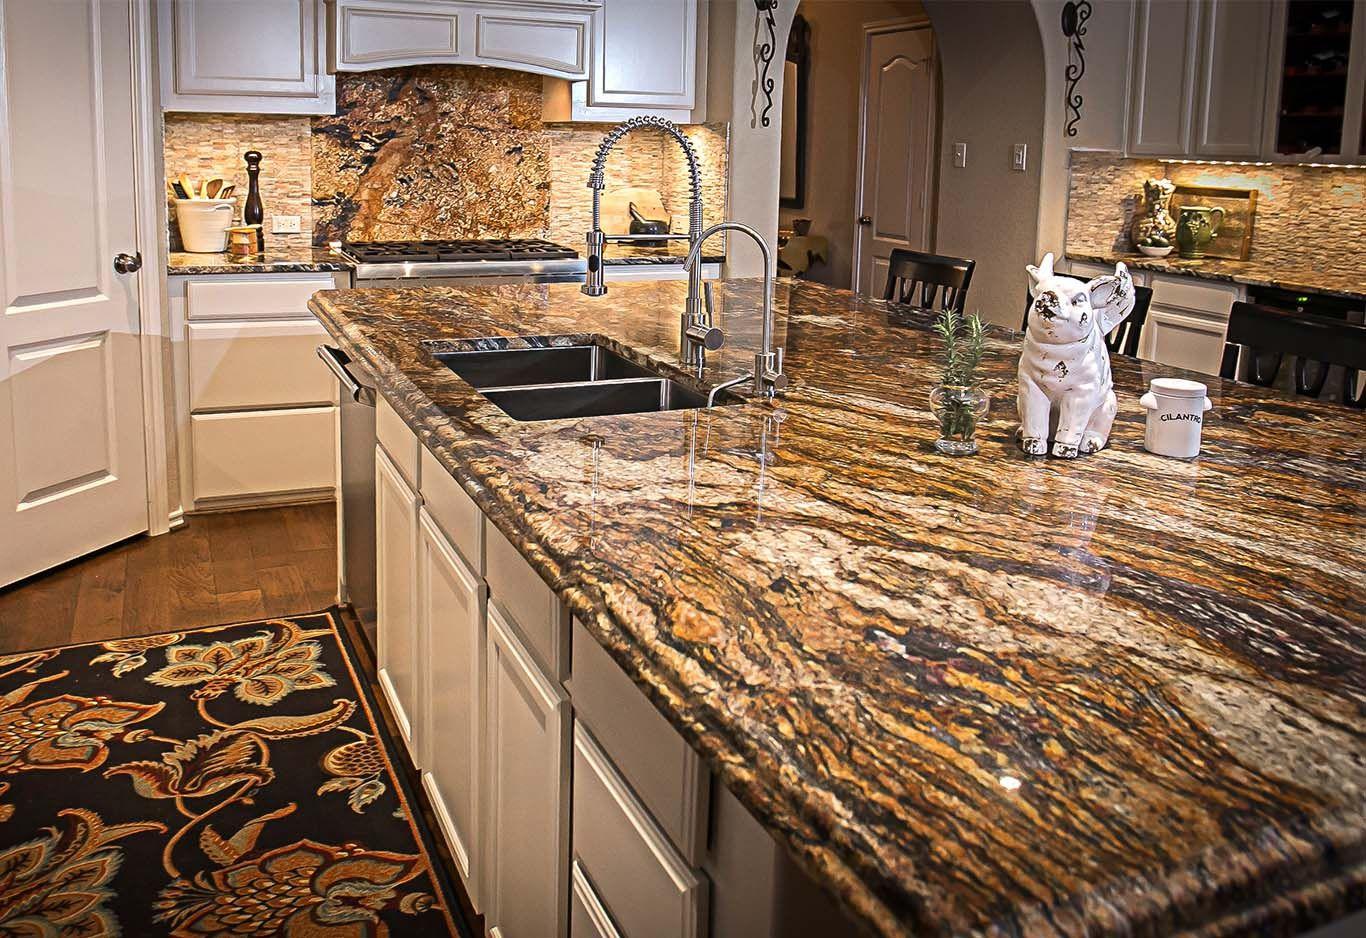 55+ Granite Countertops In Houston Tx   Backsplash For Kitchen Ideas Check  More At Http://mattinglybrewing.com/granite Countertops In Houston Tx/